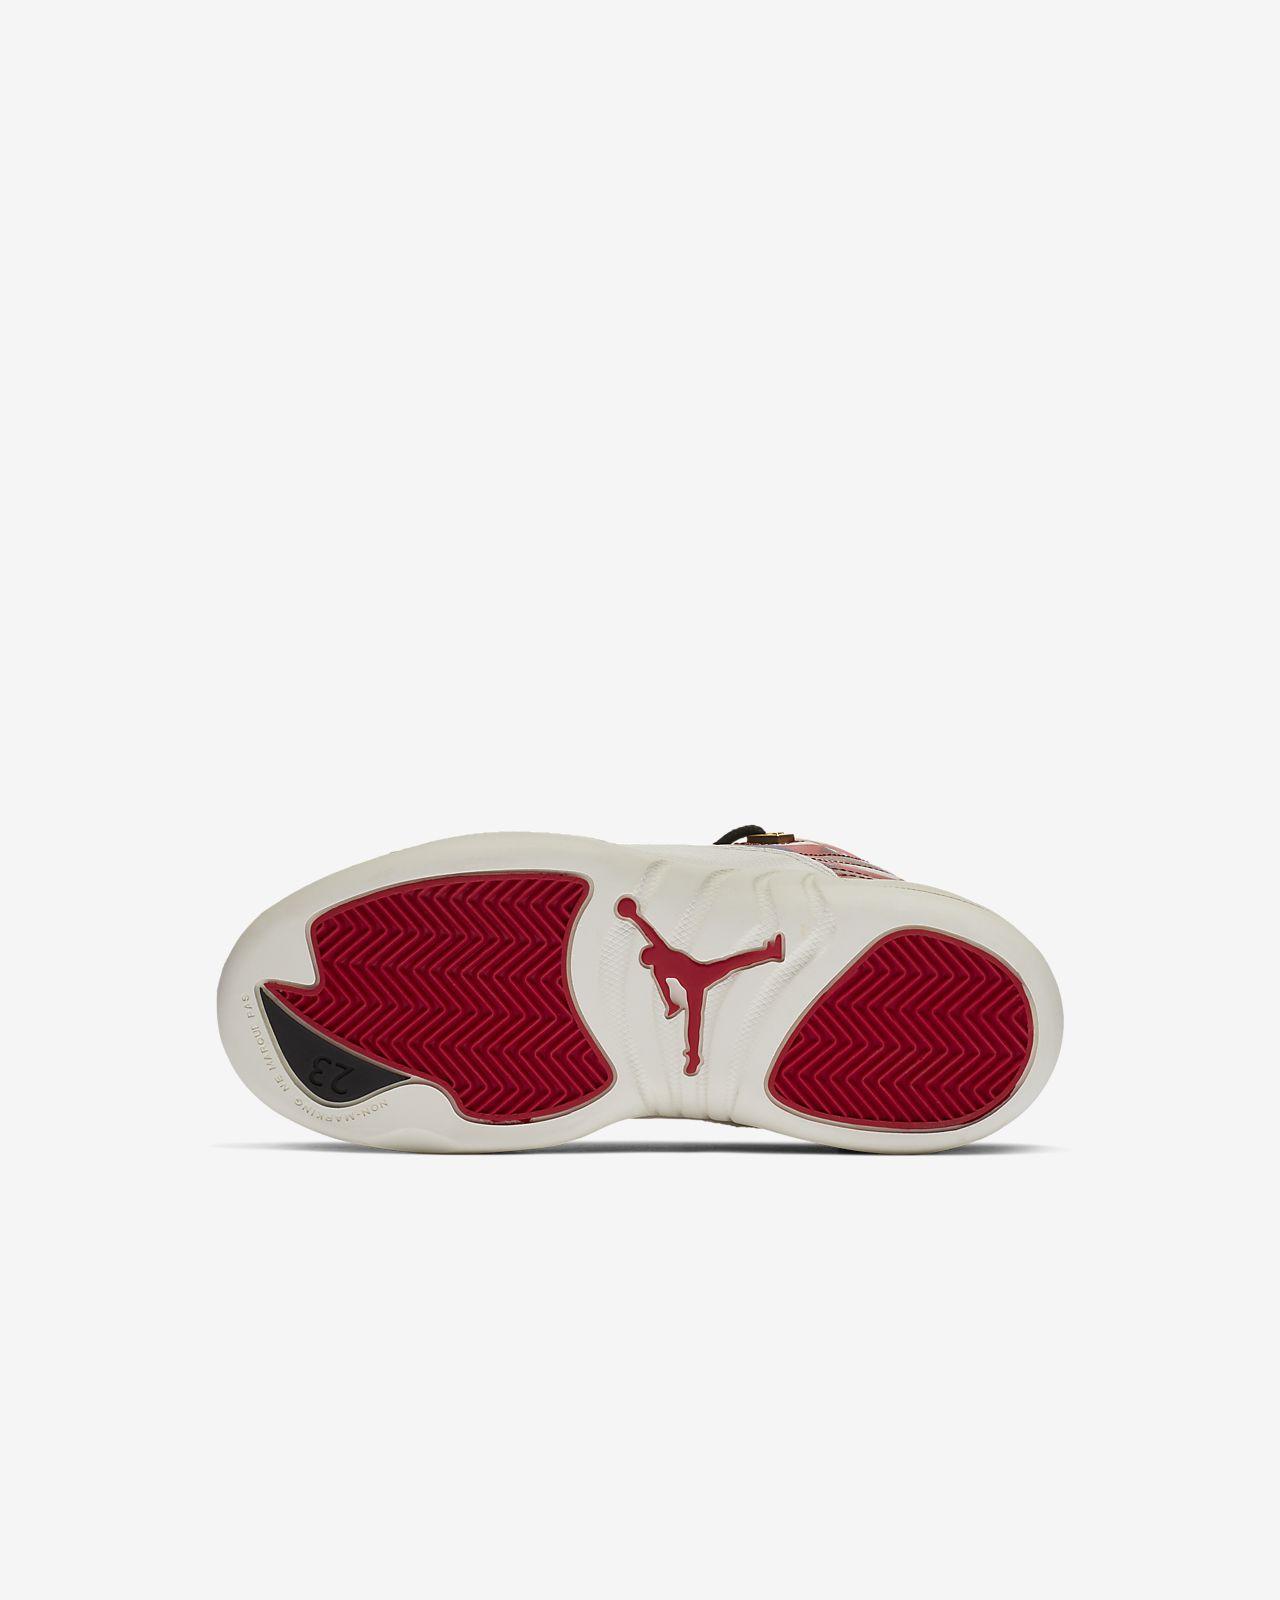 dfb9a58e8dbf6f Air Jordan 12 Retro CNY Little Kids  Shoe. Nike.com